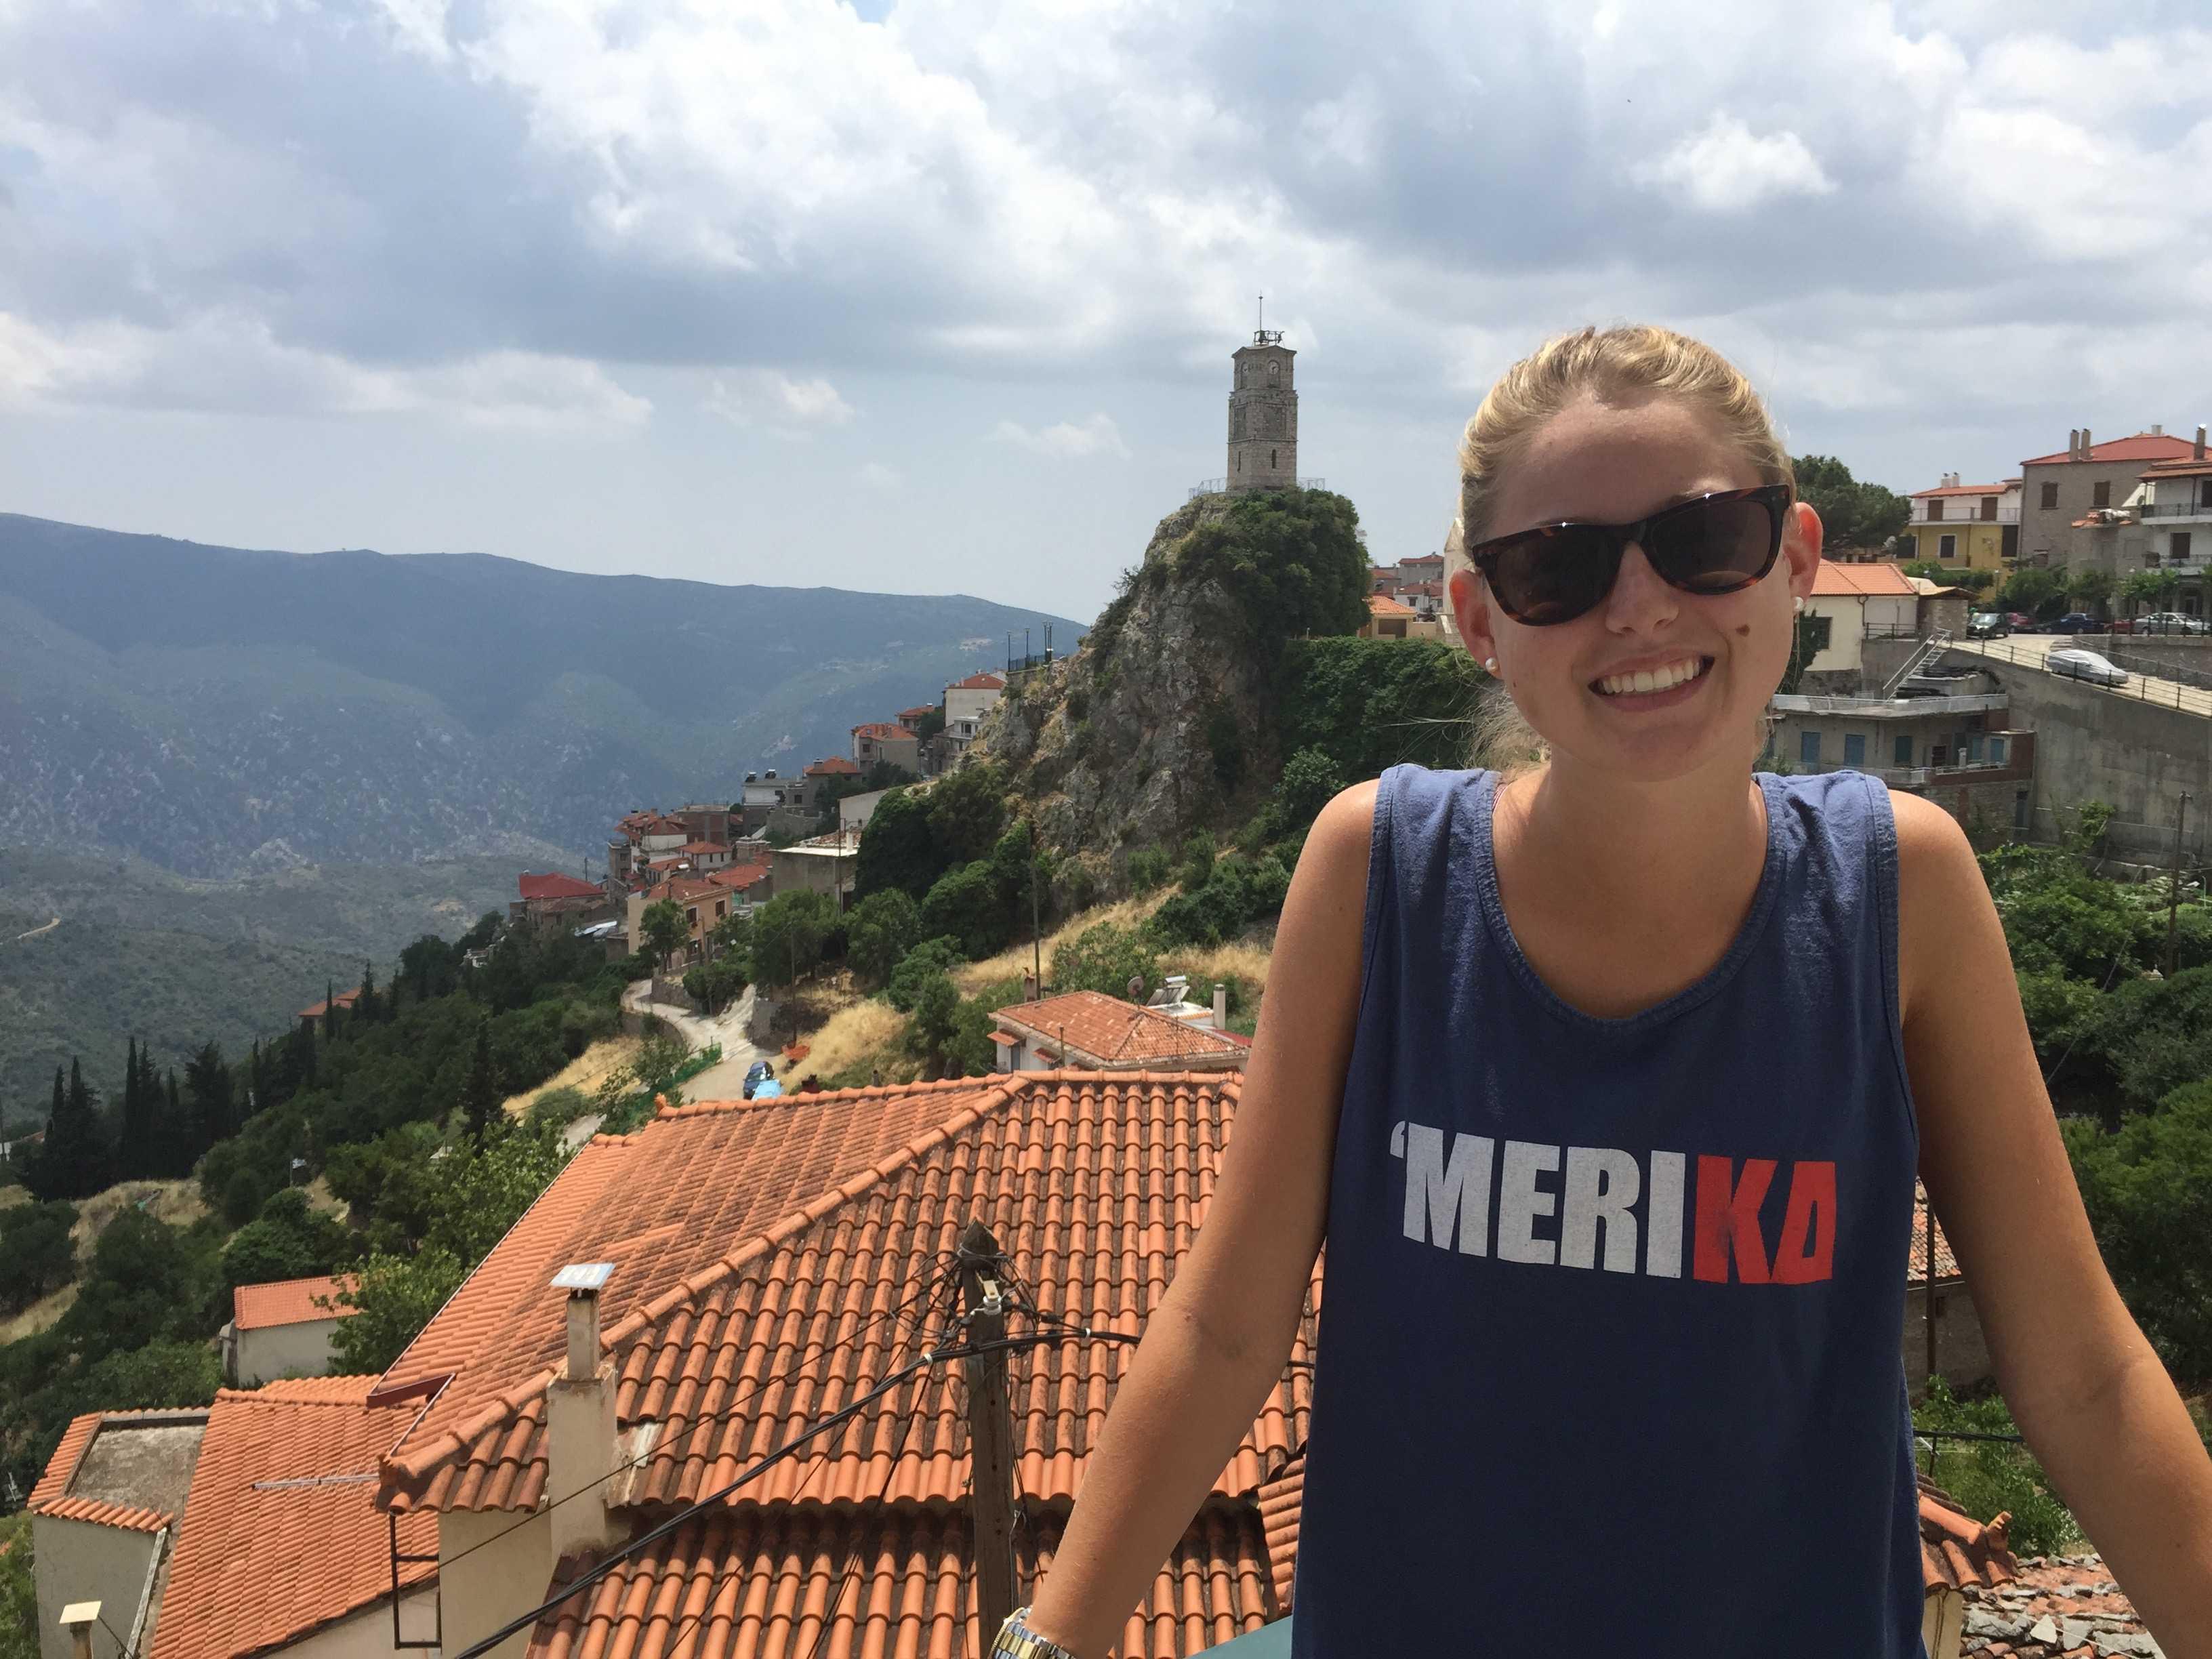 Student Caroline Dodd takes leadership outside of the classroom